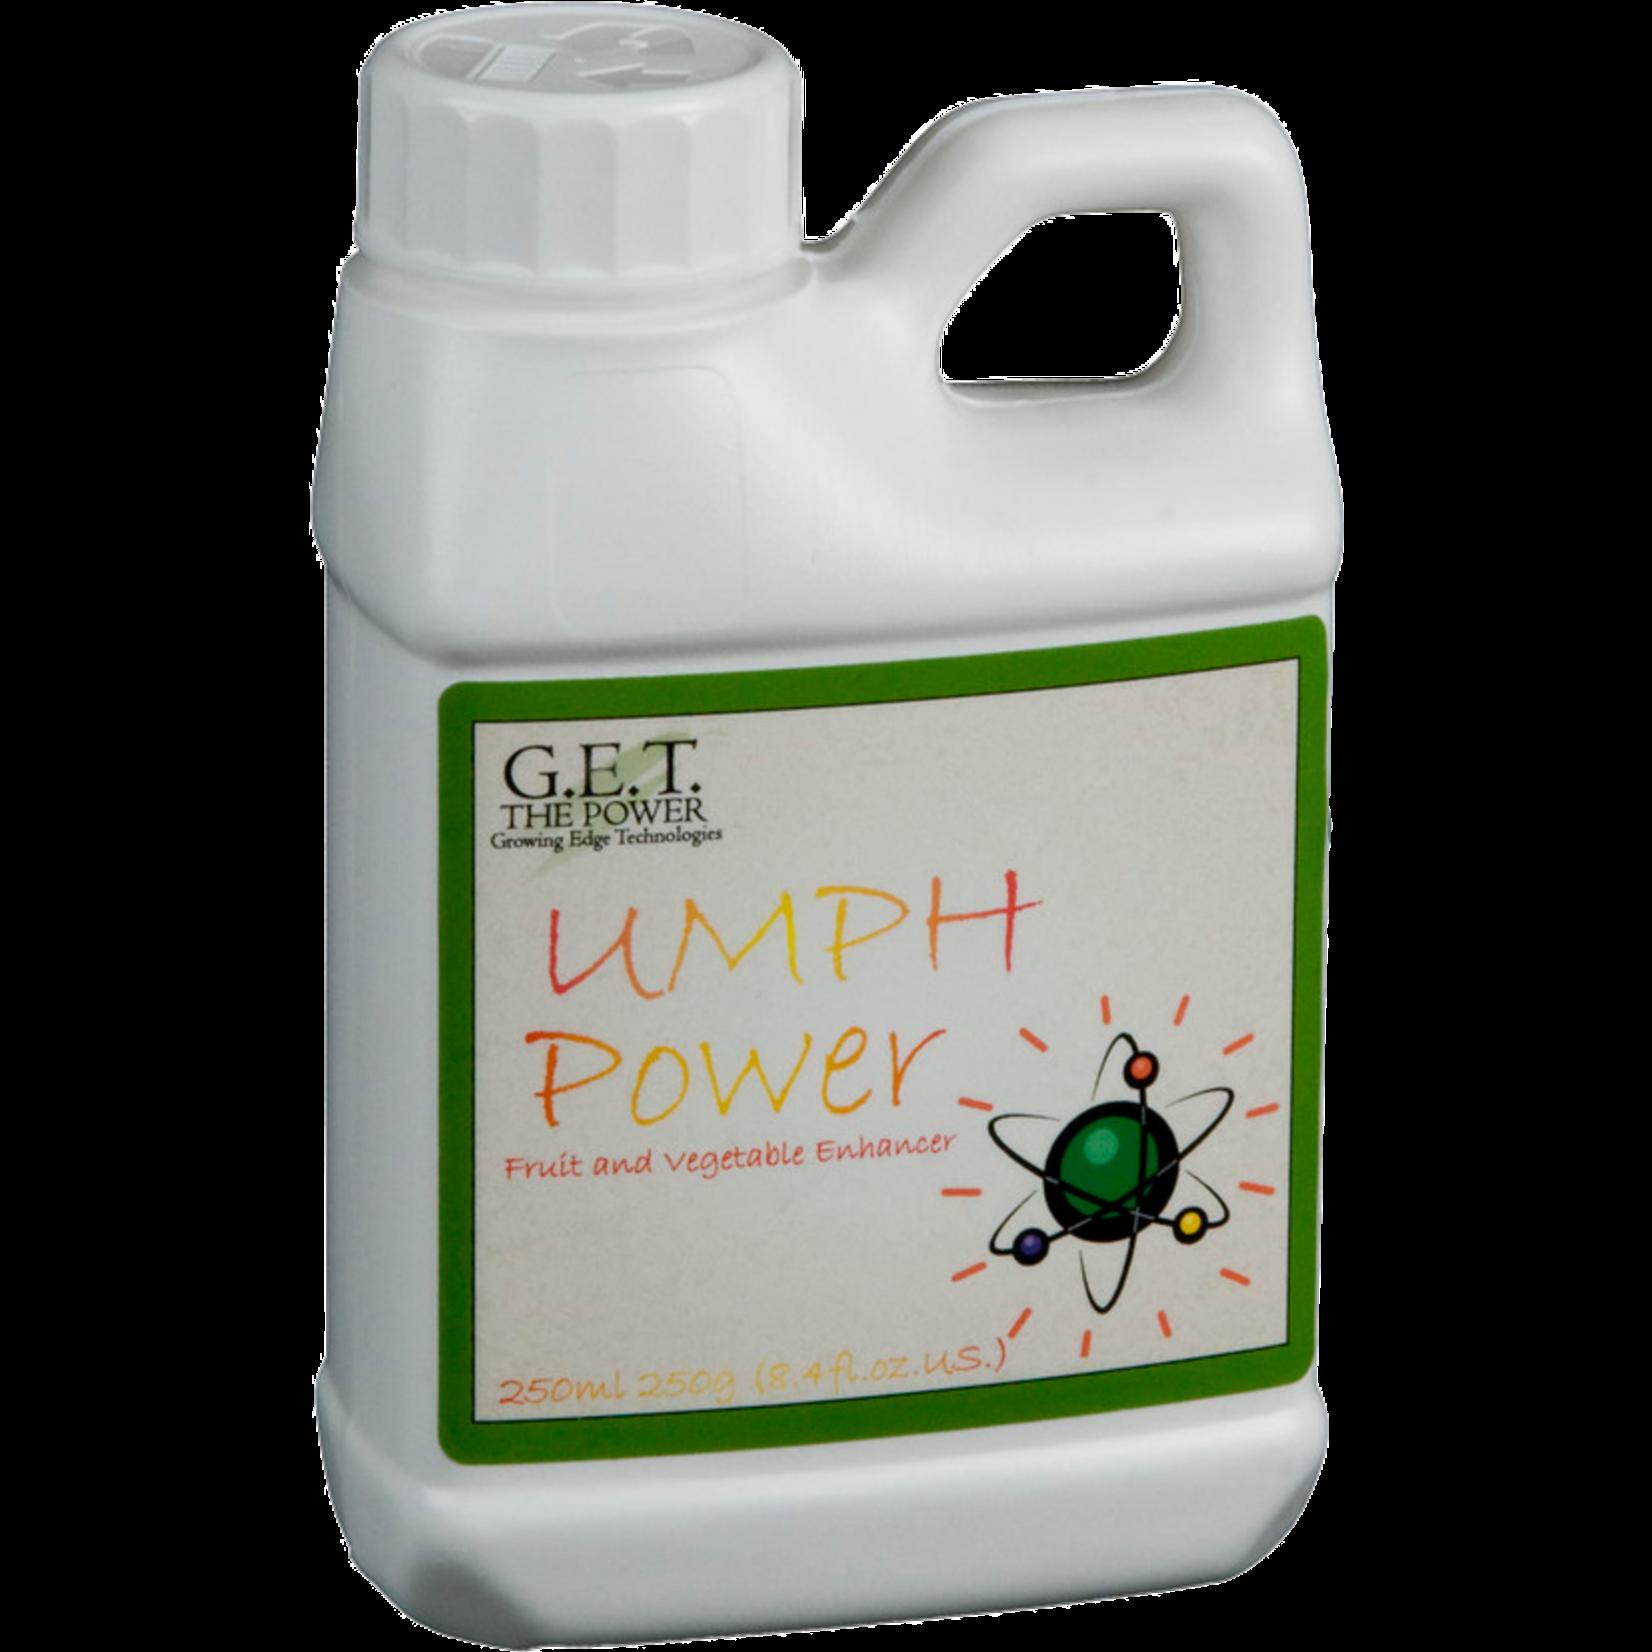 G.E.T. Nutrients Umph Power